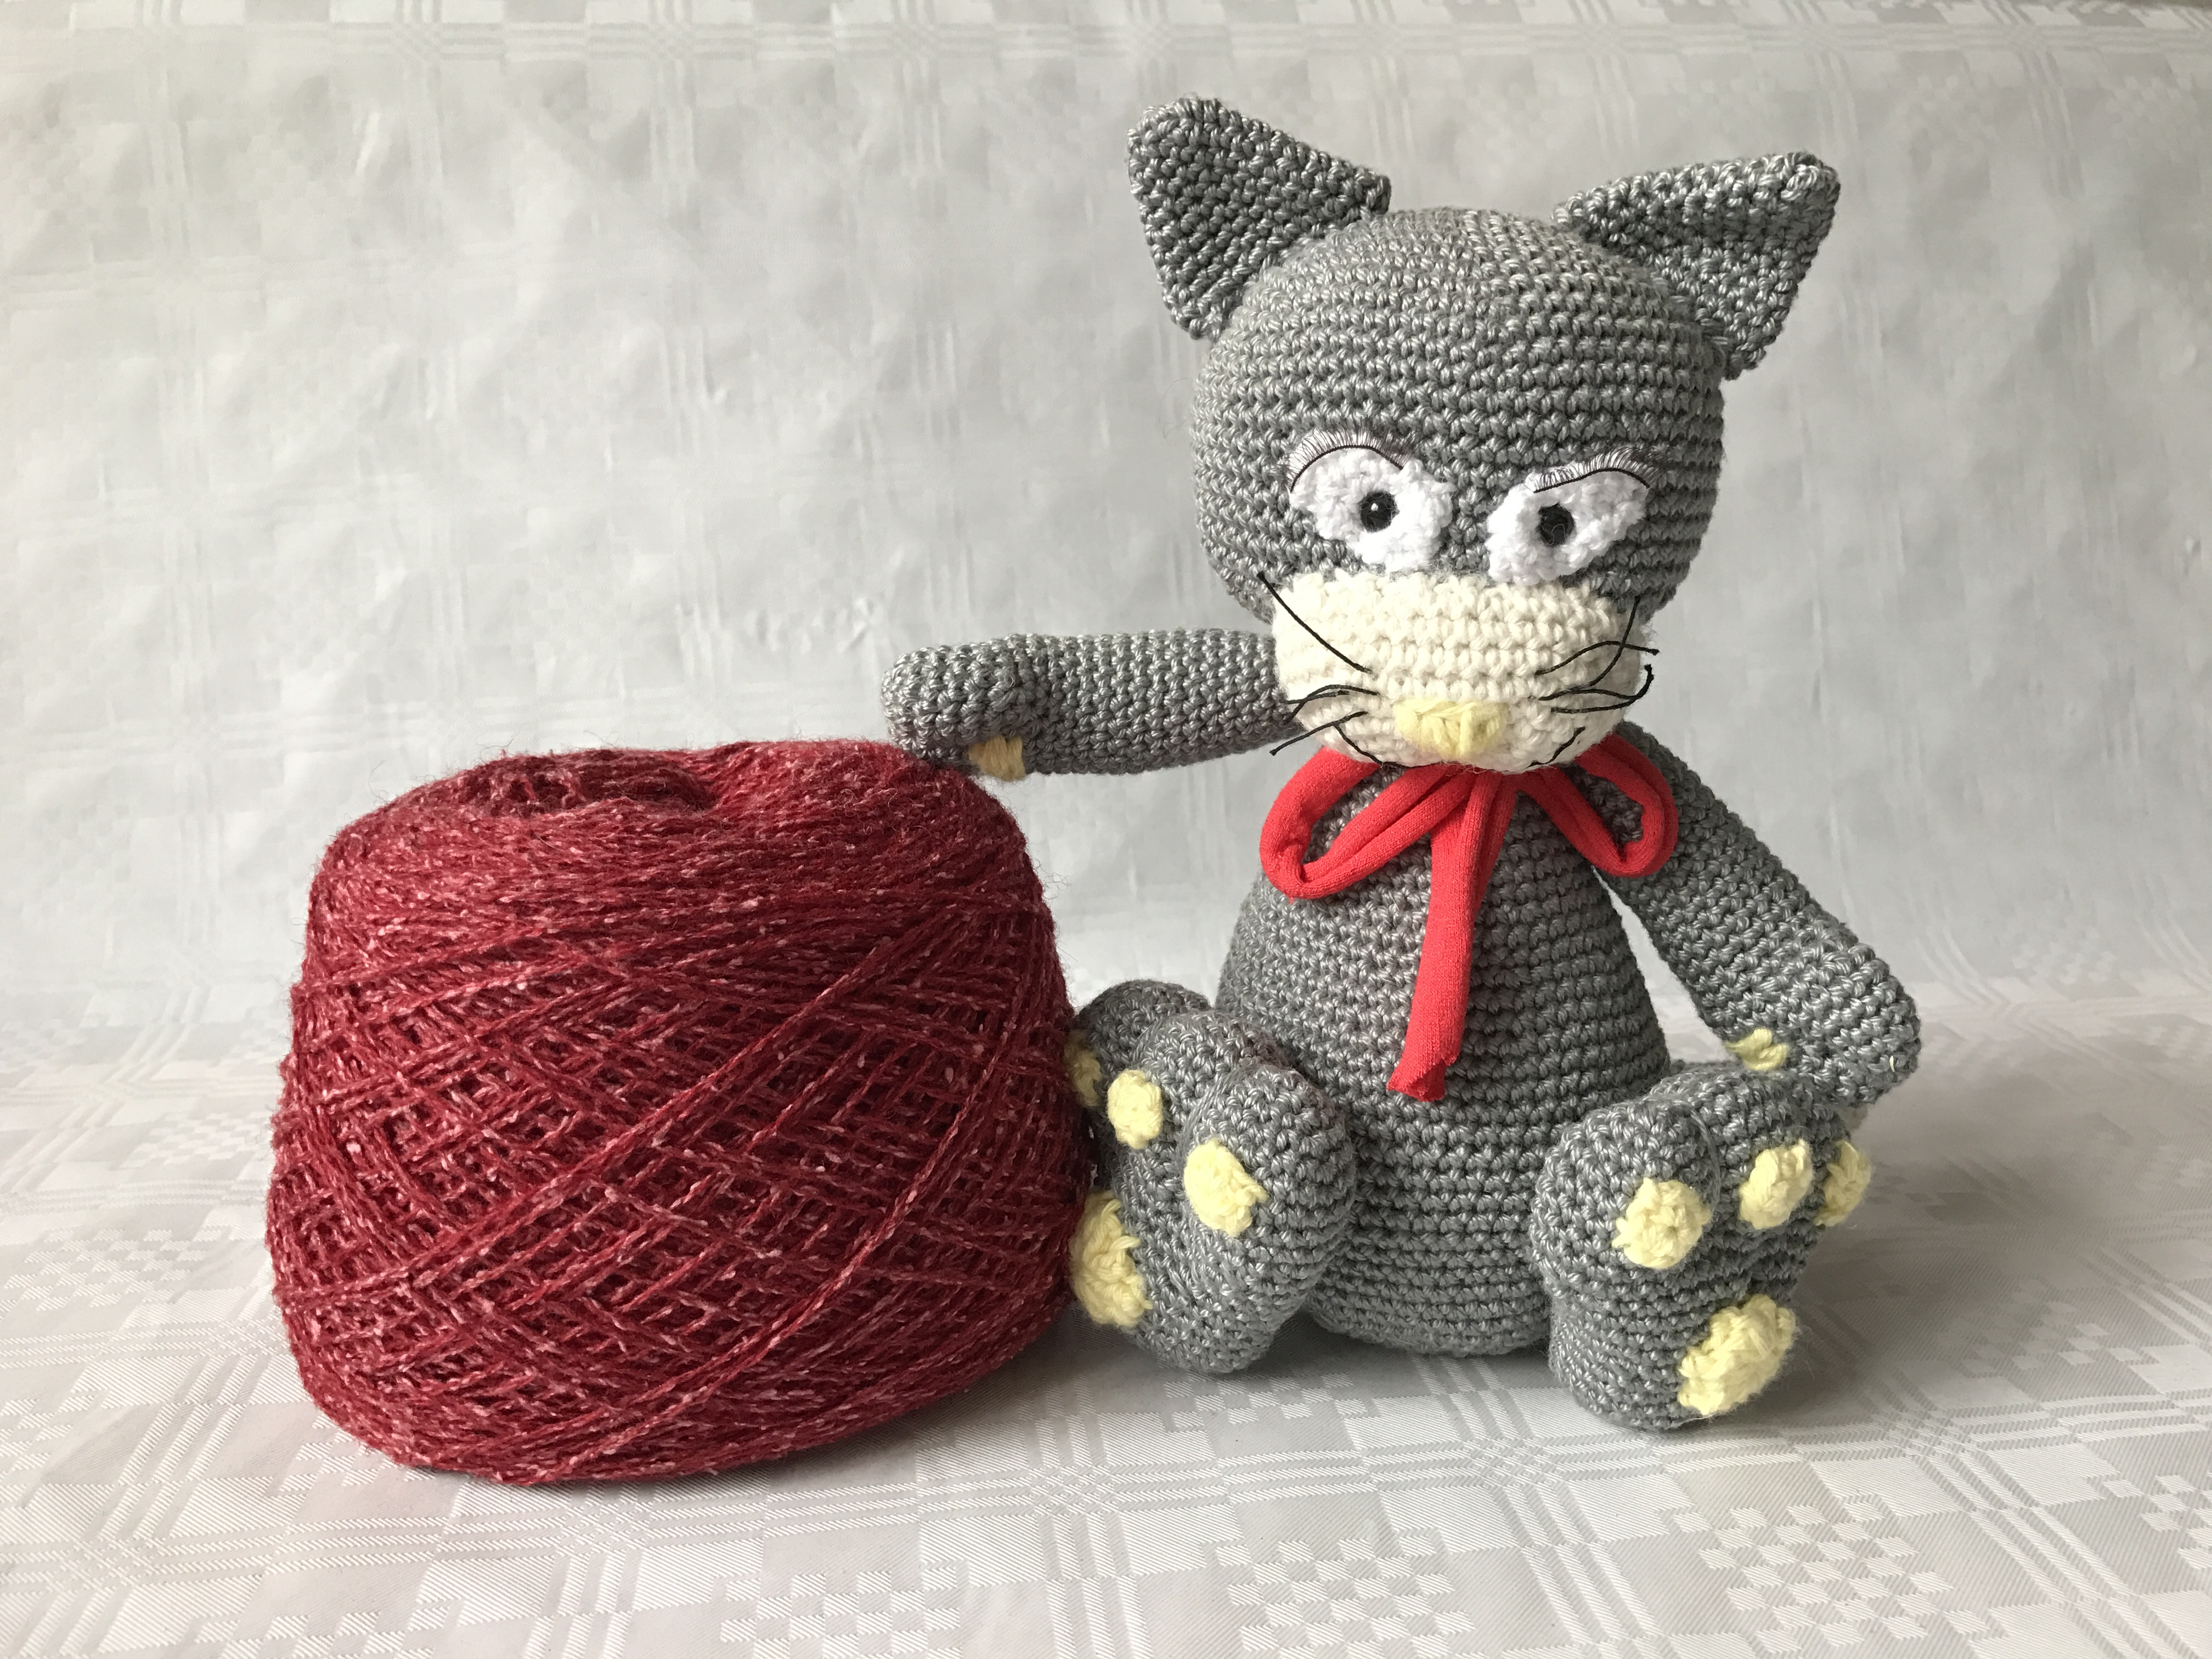 Amigurumi Pattern - Crochet Cat - Amigurumi Cat Doll - Amigurumi ... | 3024x4032